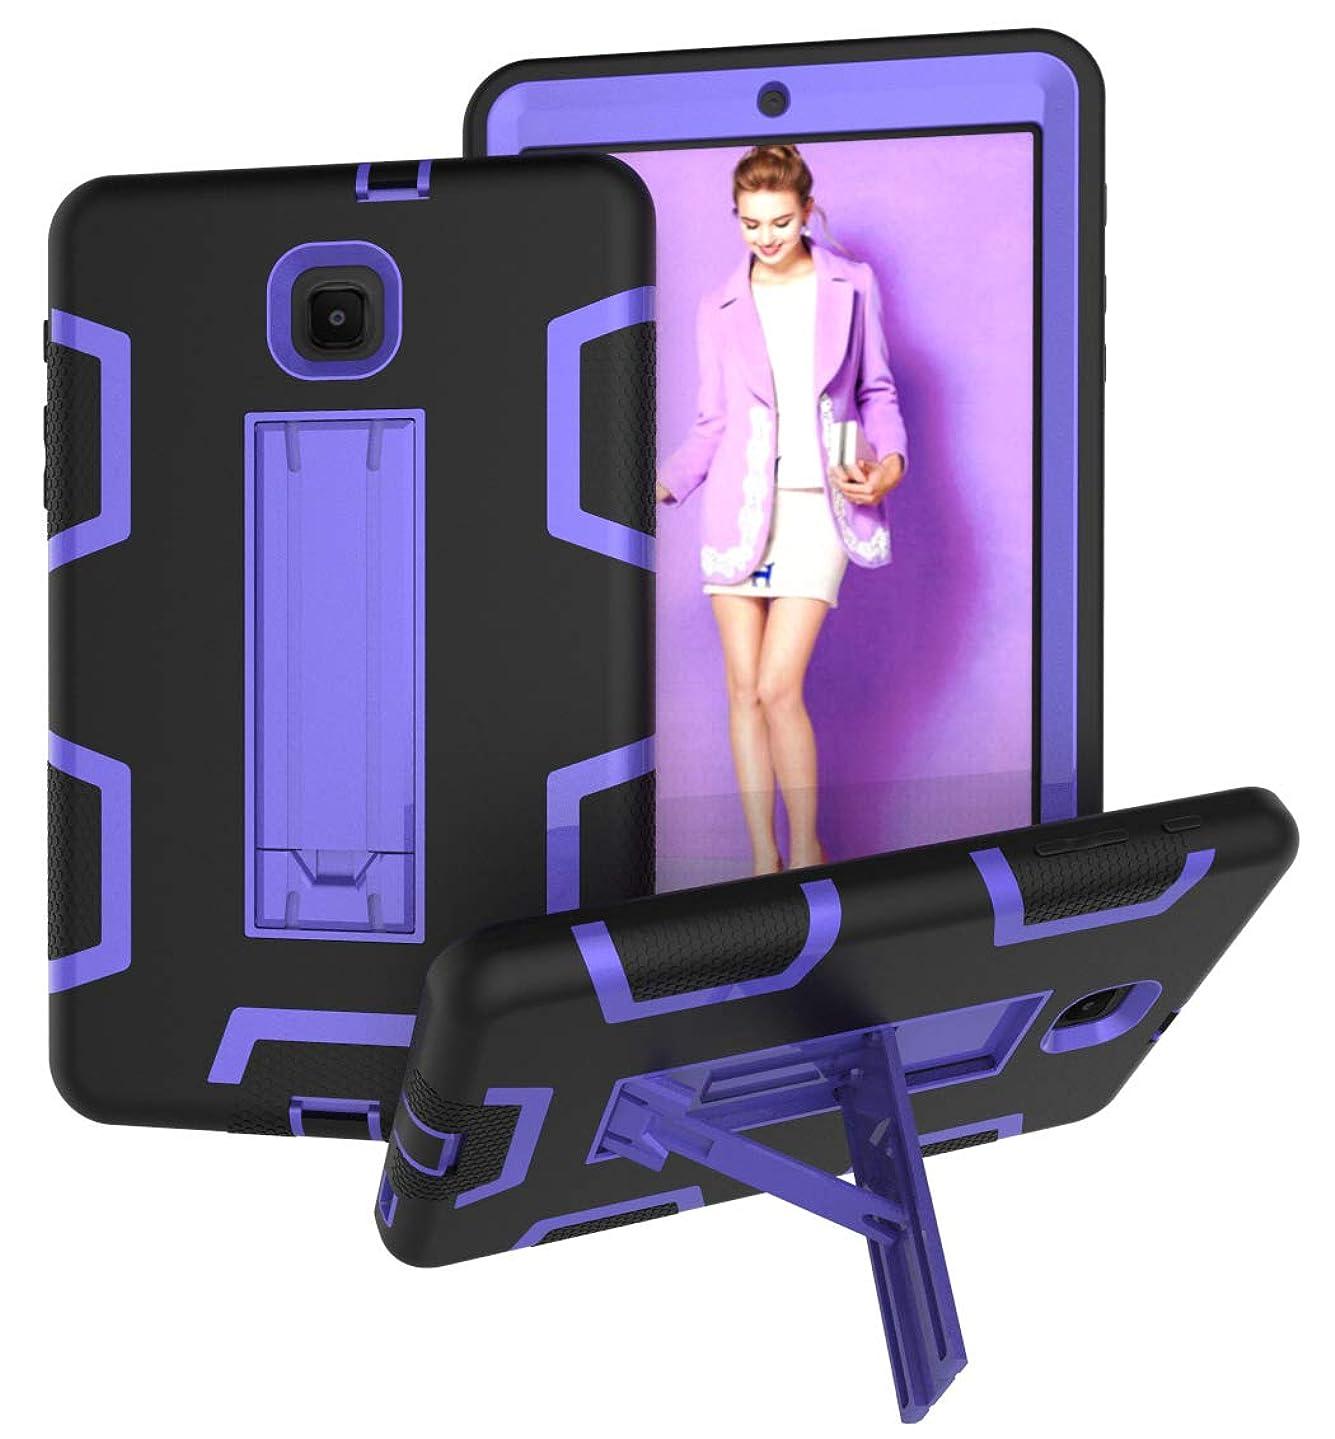 Galaxy Tab A 8.0 2018 Case, ZERMU Heavy Duty Kickstand Shockproof Hard Plastic+Silicone Defender High Impact Rugged Bumper Full-Body Protective Case for Samsung Galaxy Tab A 8.0 (2018) SM-T387